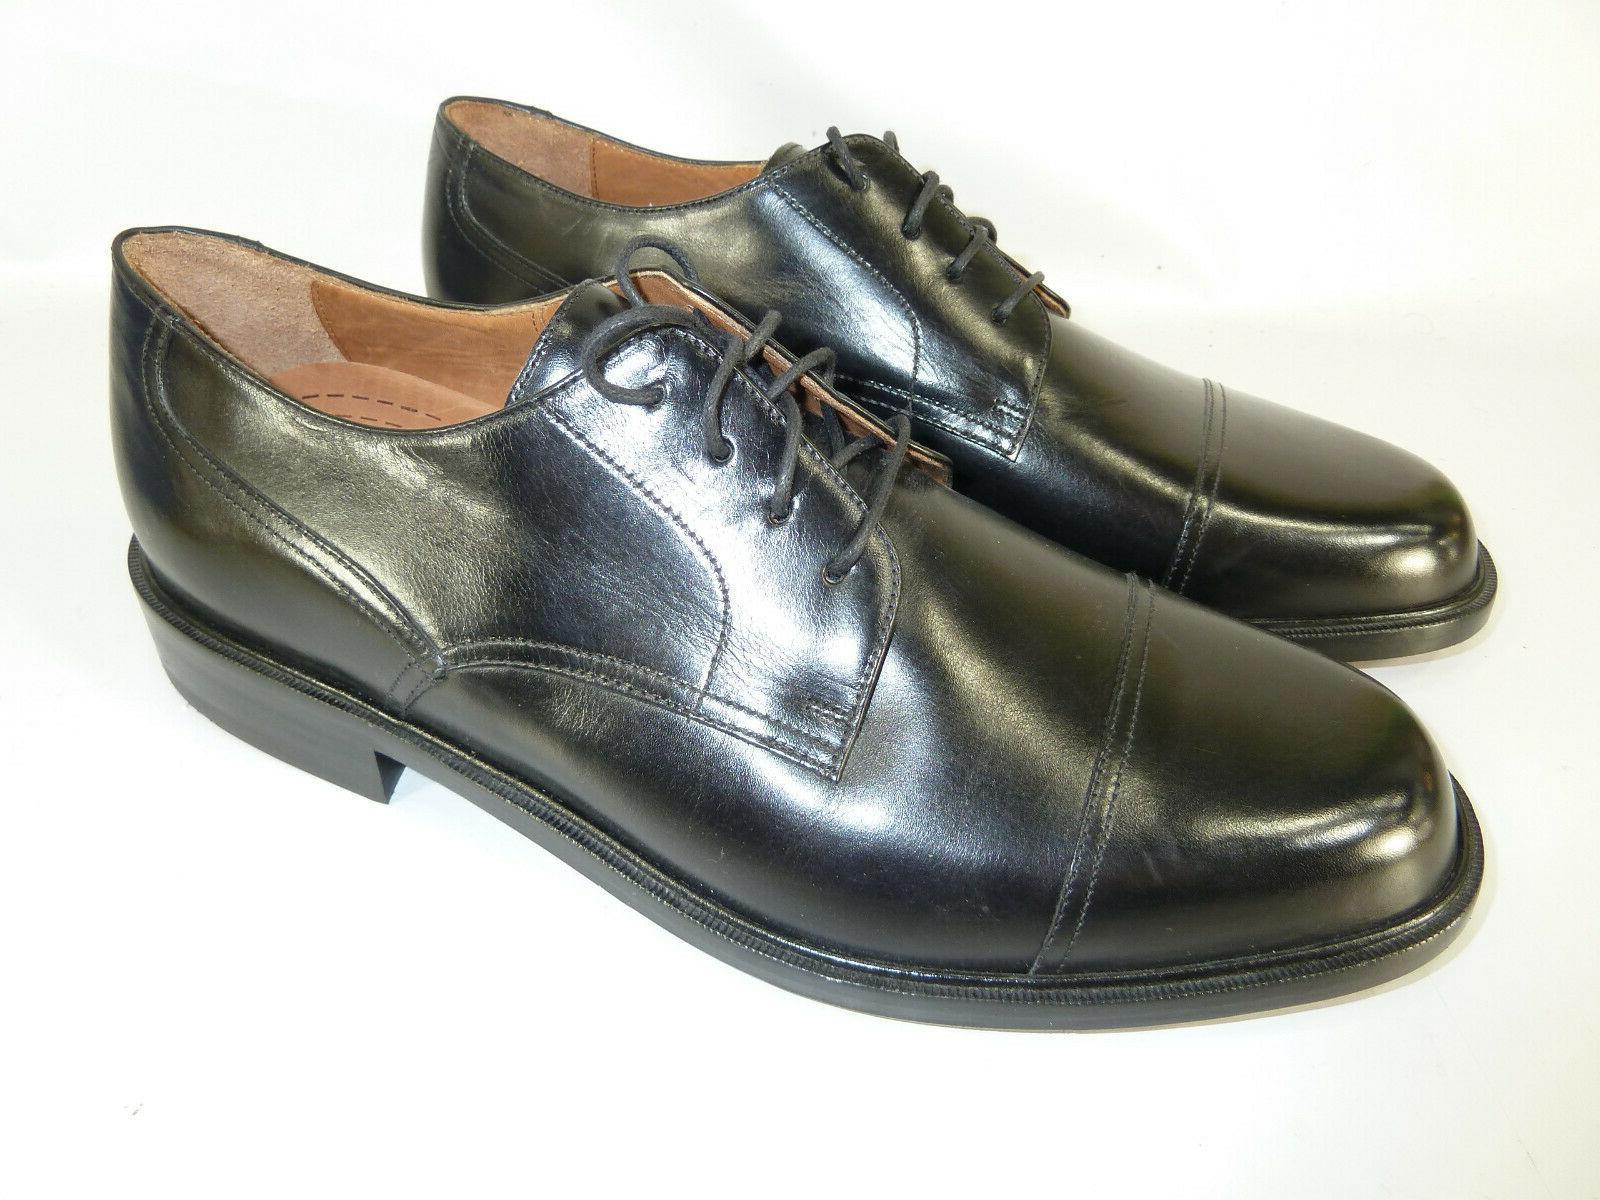 black cap toe oxford shoes 9 5